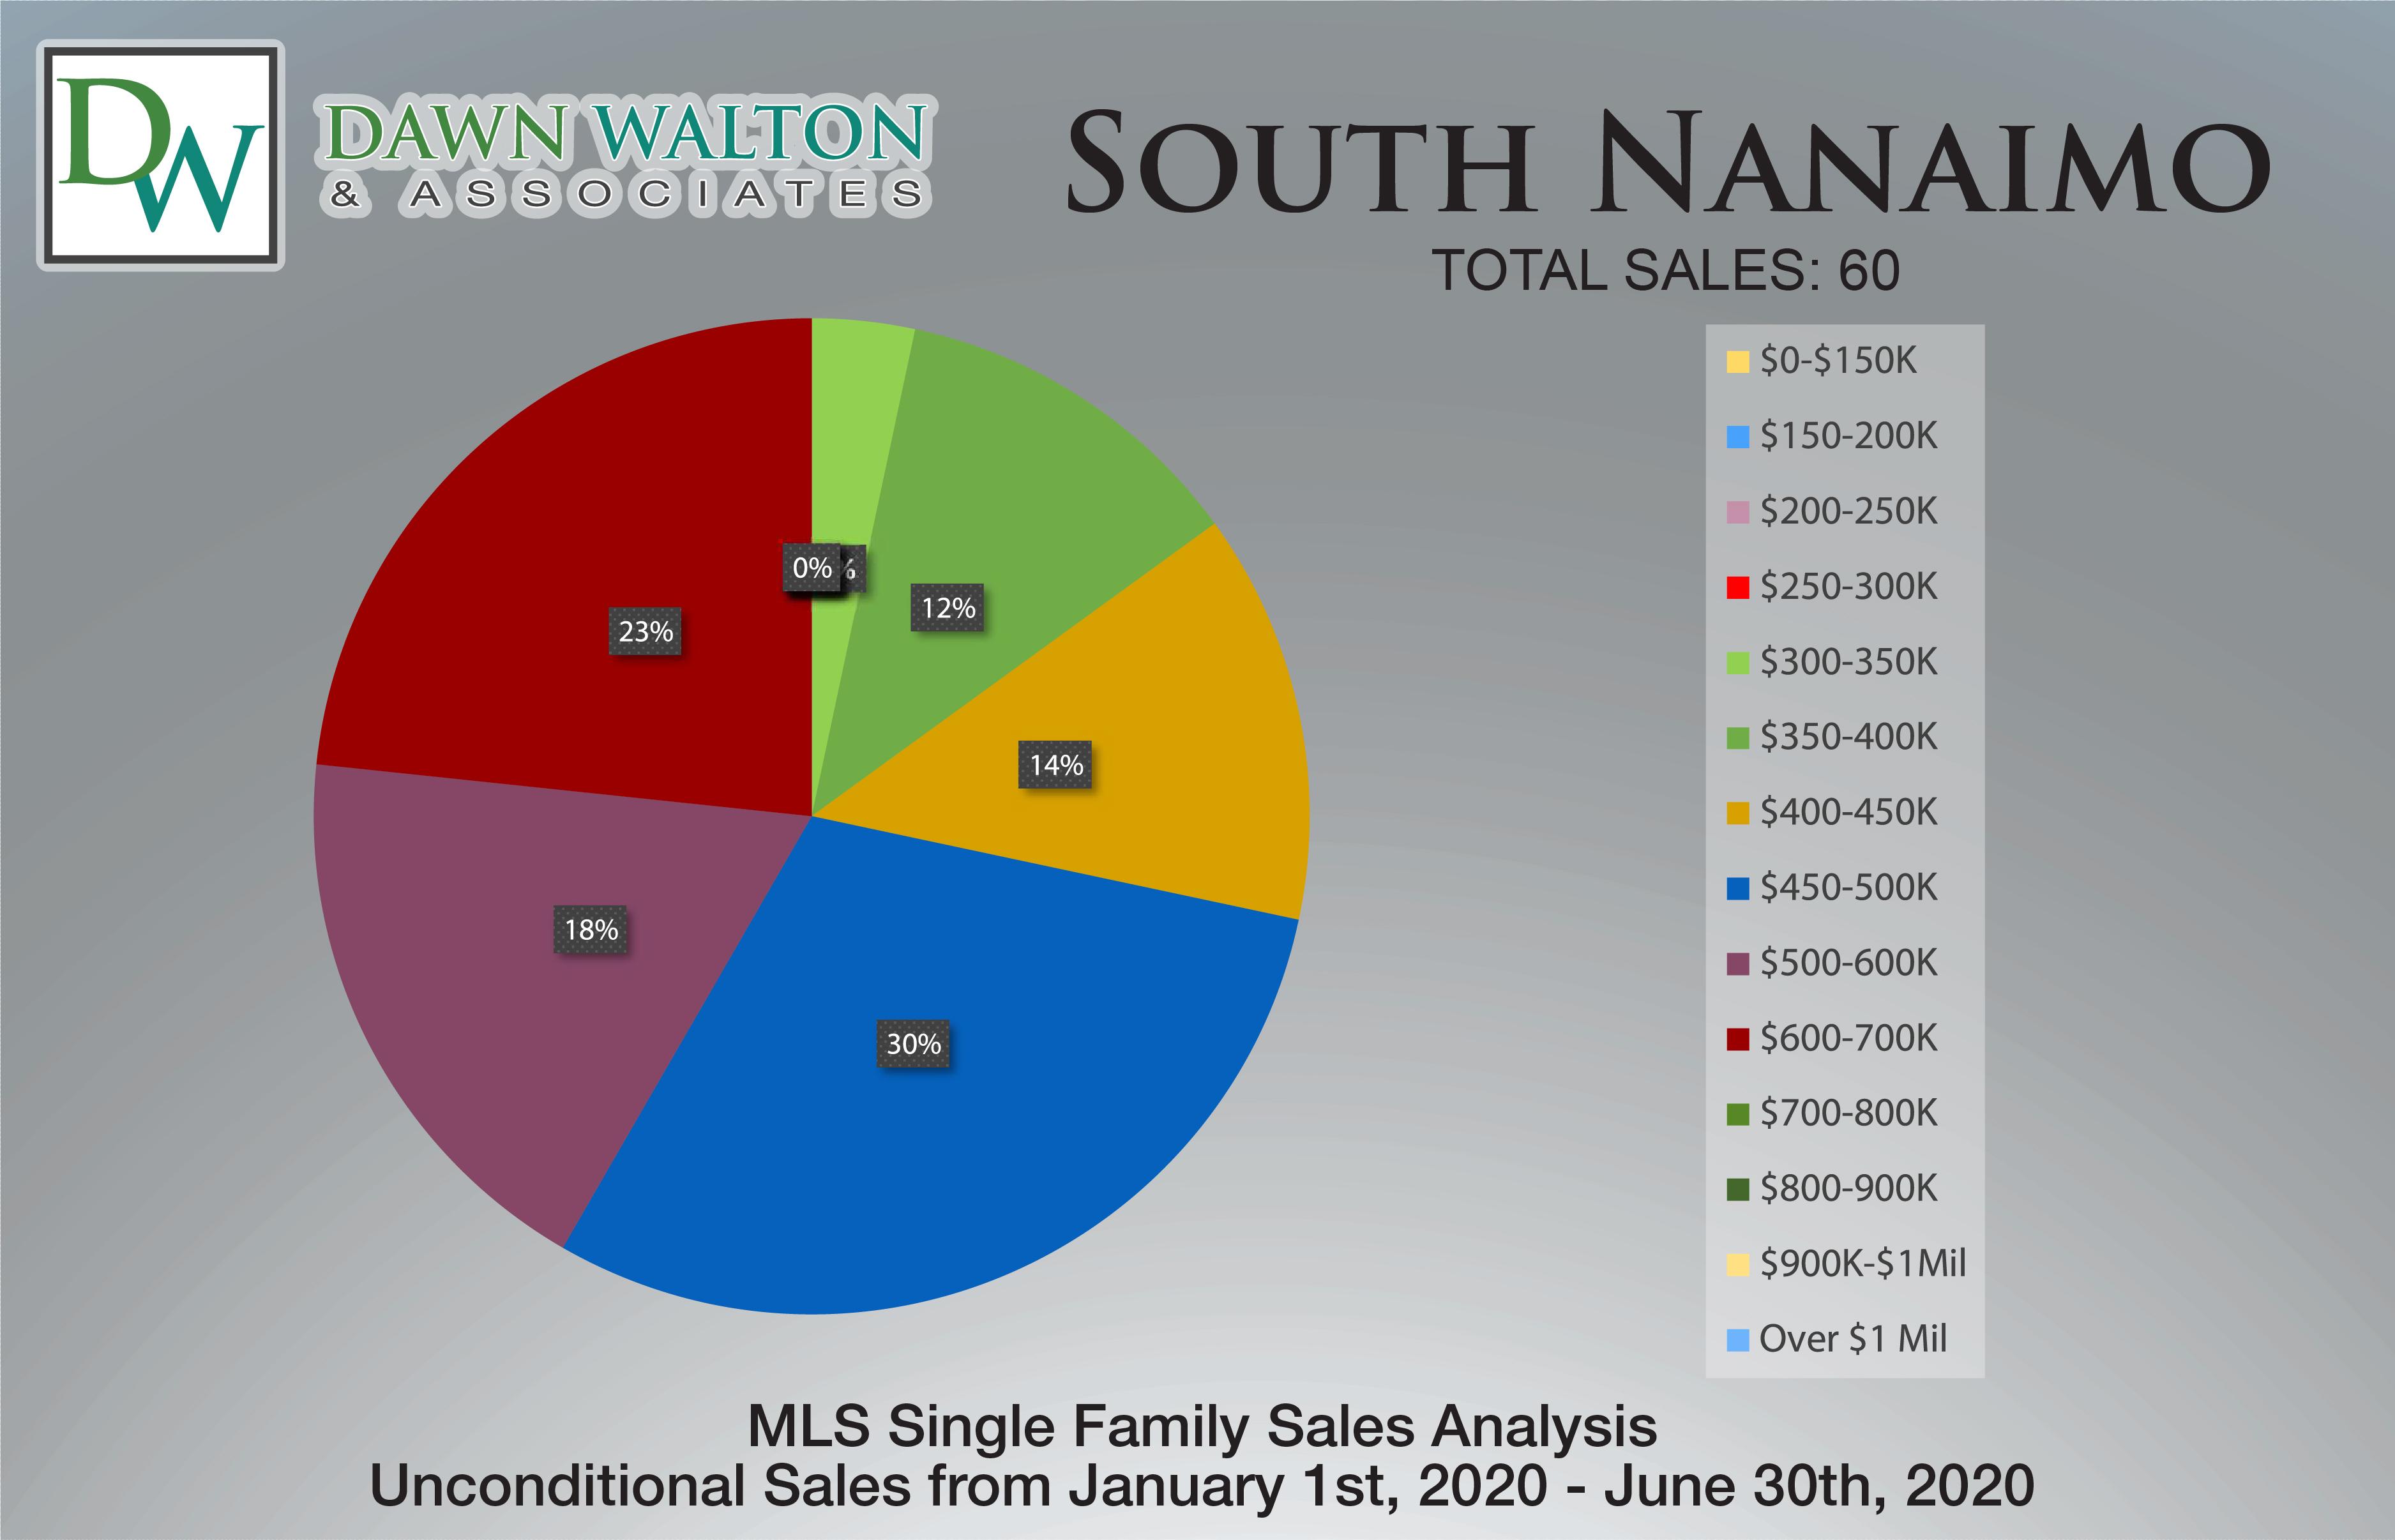 South Nanaimo Real Estate Market Stats Price Percentage Jan 1- June 30th  2020 - Nanaimo Realtor Dawn Walton